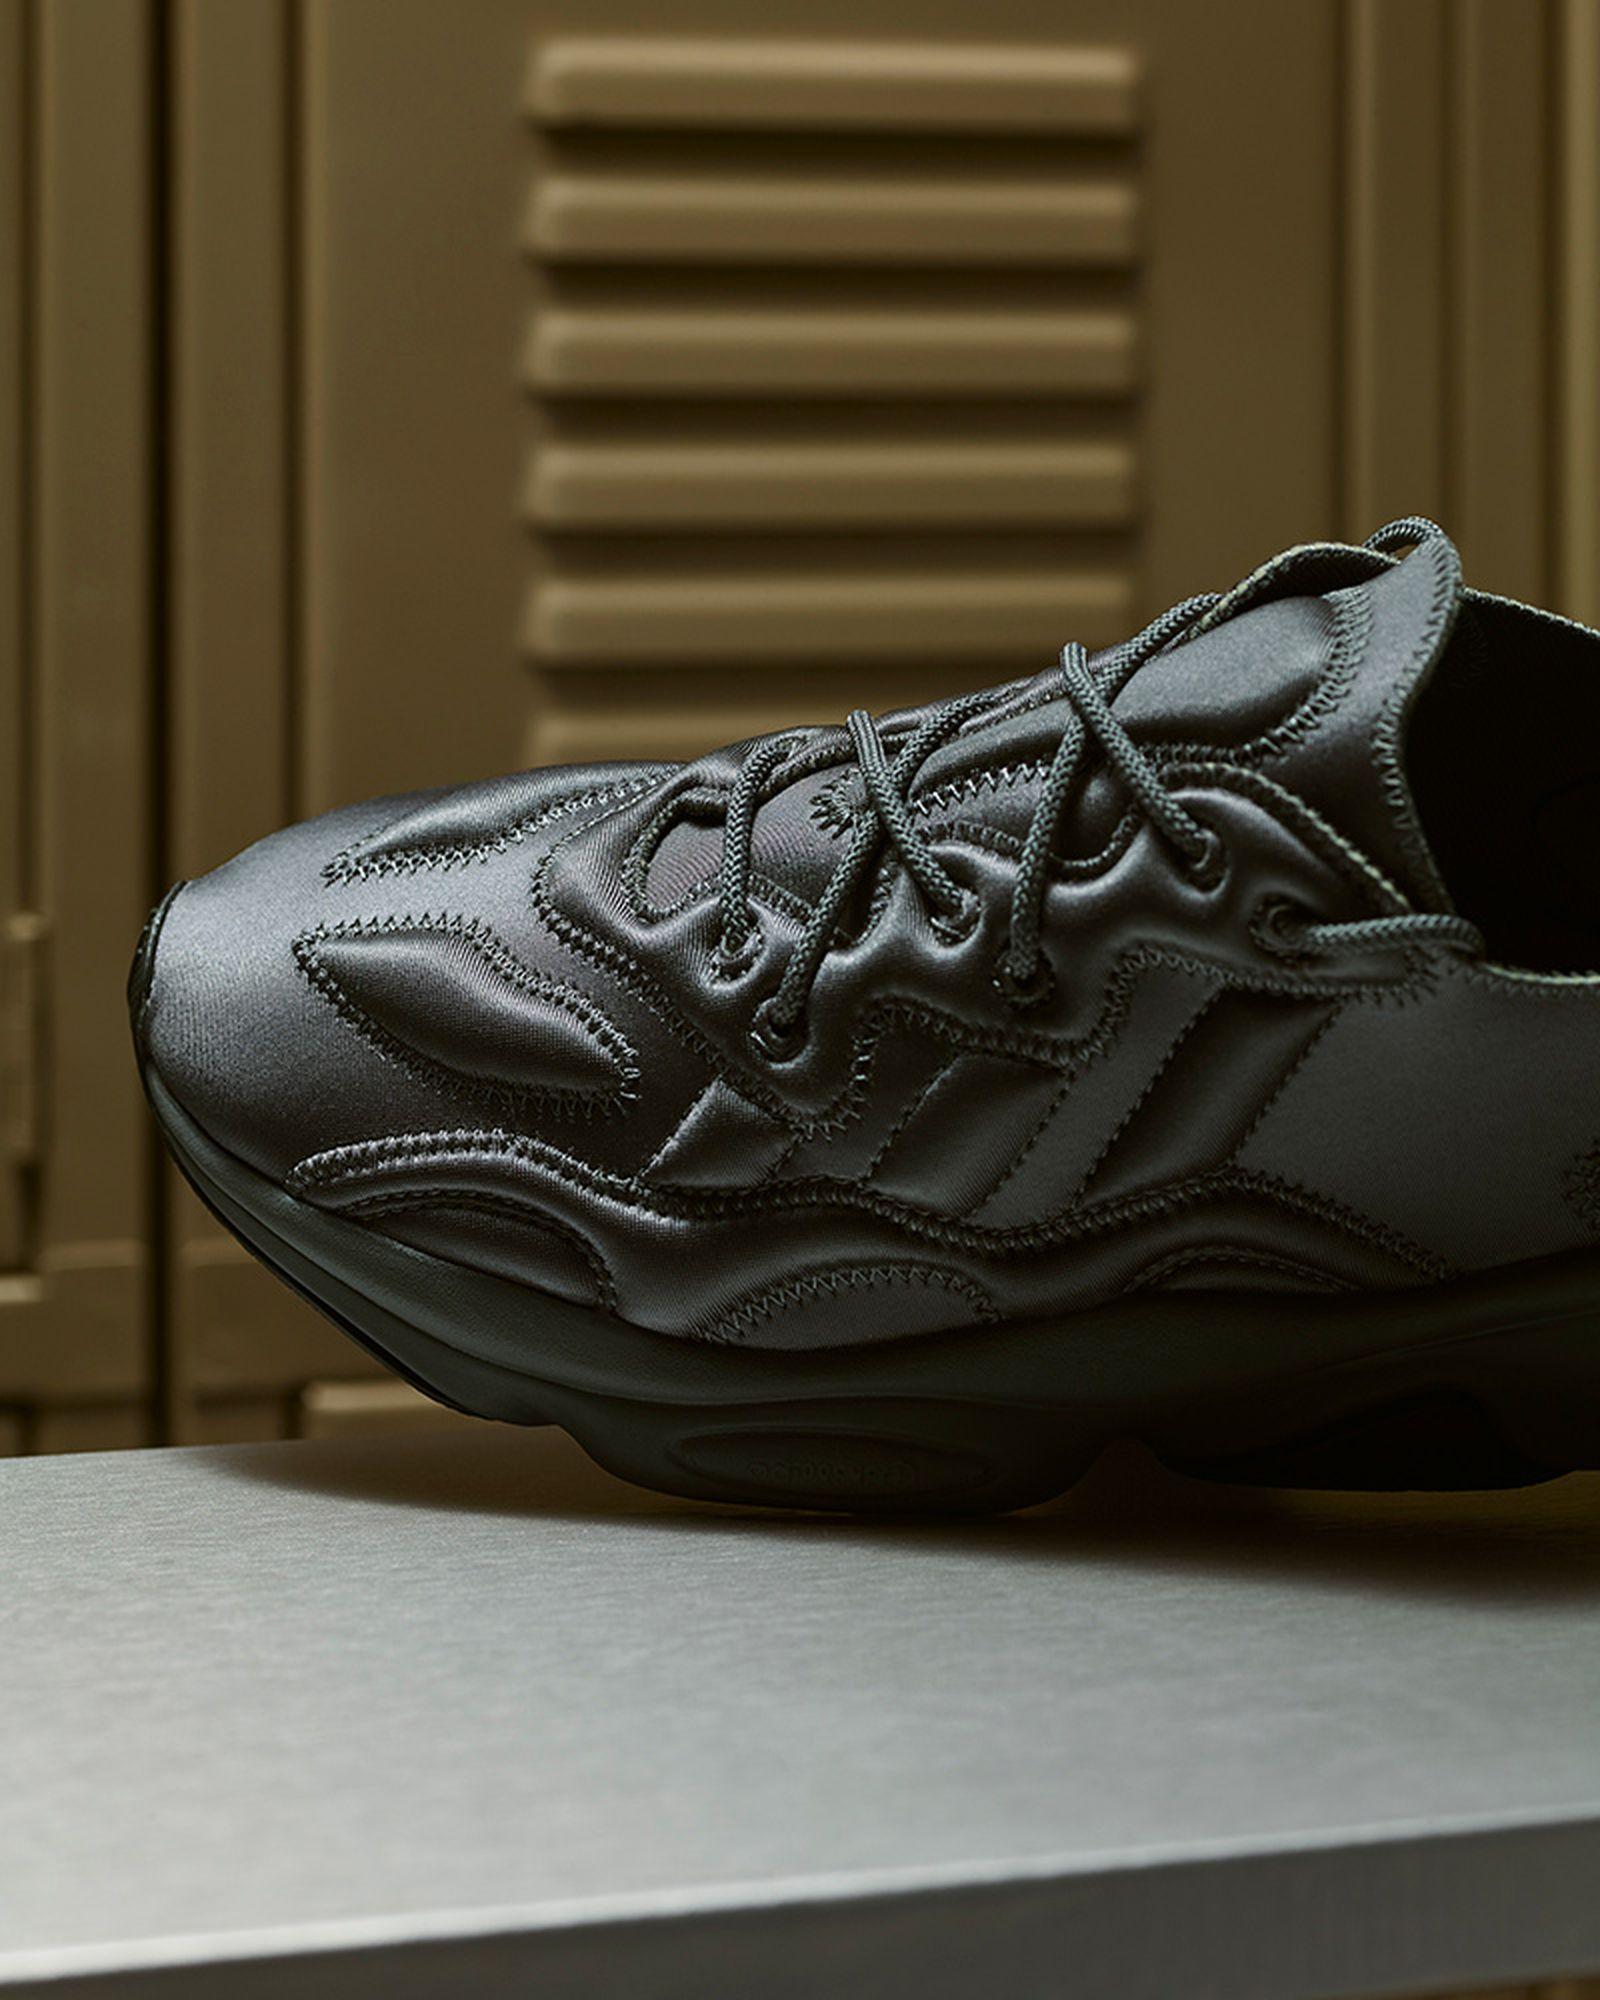 adidas-originals-ozweego-tech-moon-landing-release-date-price-04